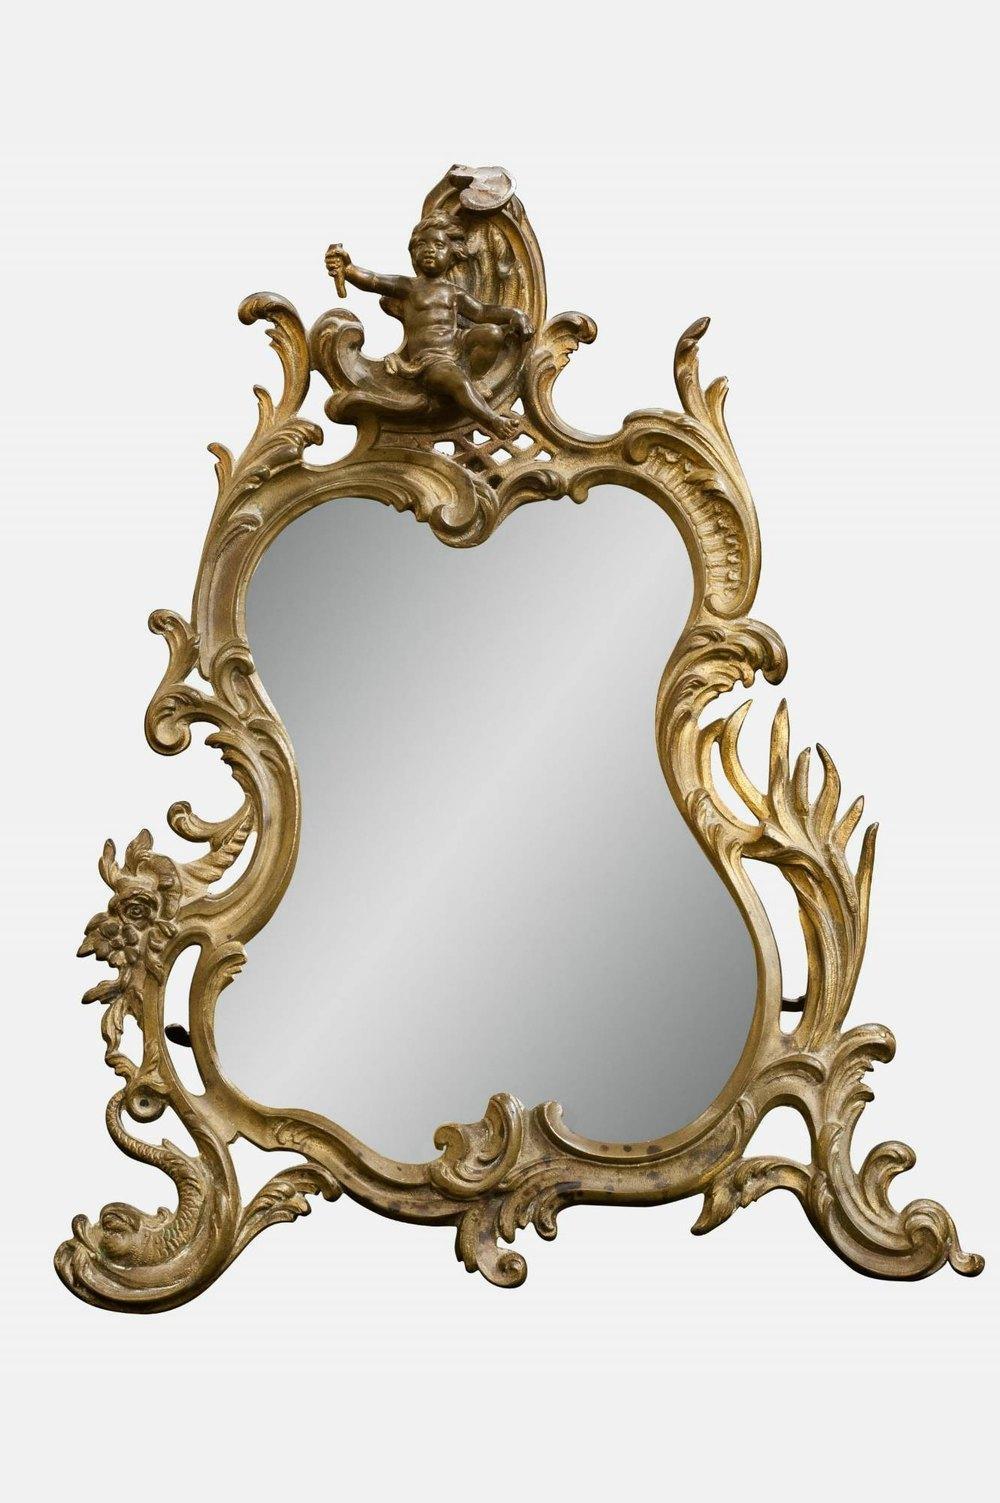 Antiques Atlas – Rococo Style Easel Mirror Regarding French Rococo Mirror (Image 11 of 20)